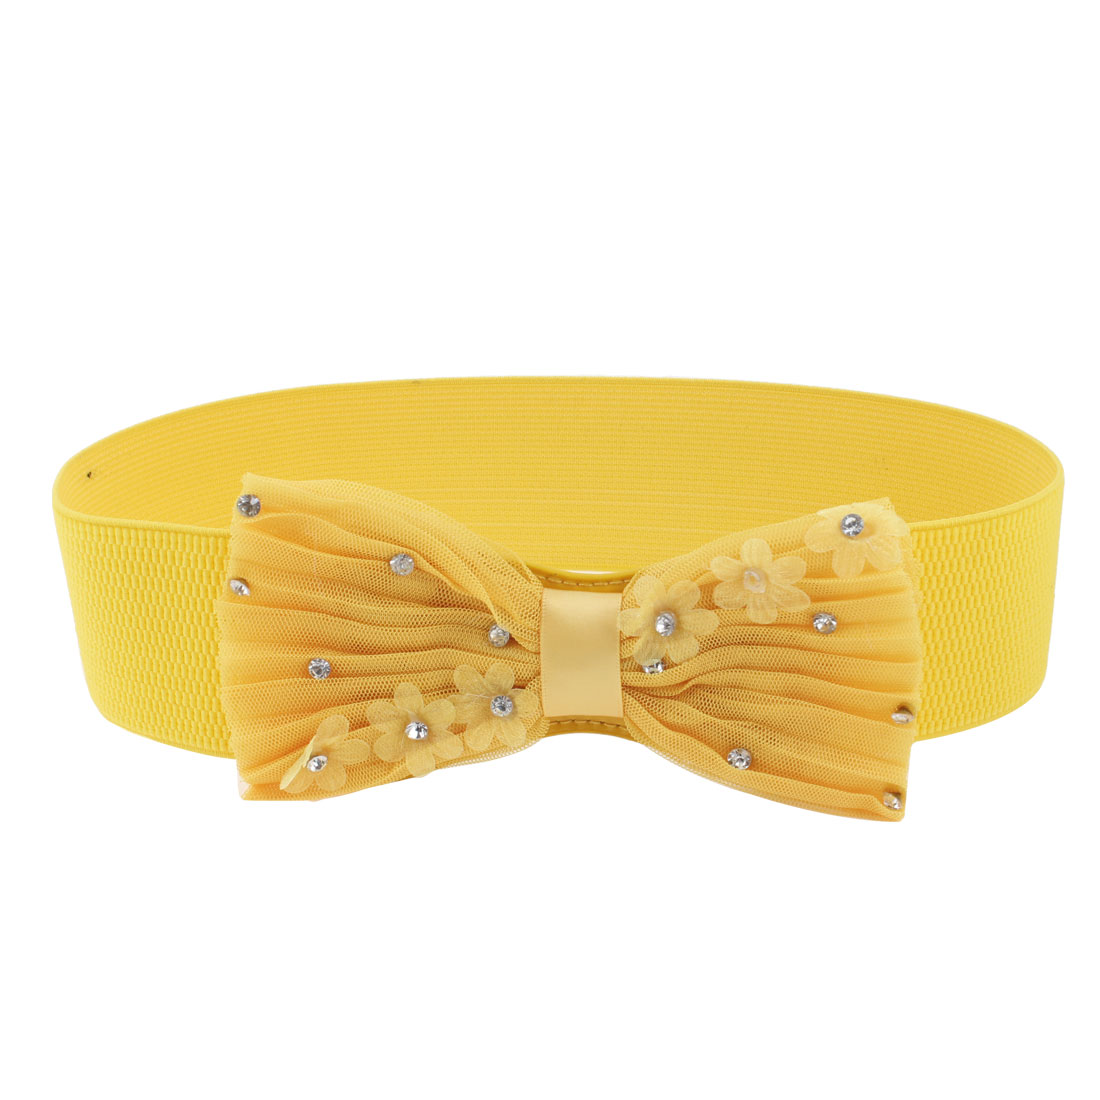 Lady Flower Bowknot Press Stud Buckle Stretch Wide Skinny Cinch Waistband Yellow